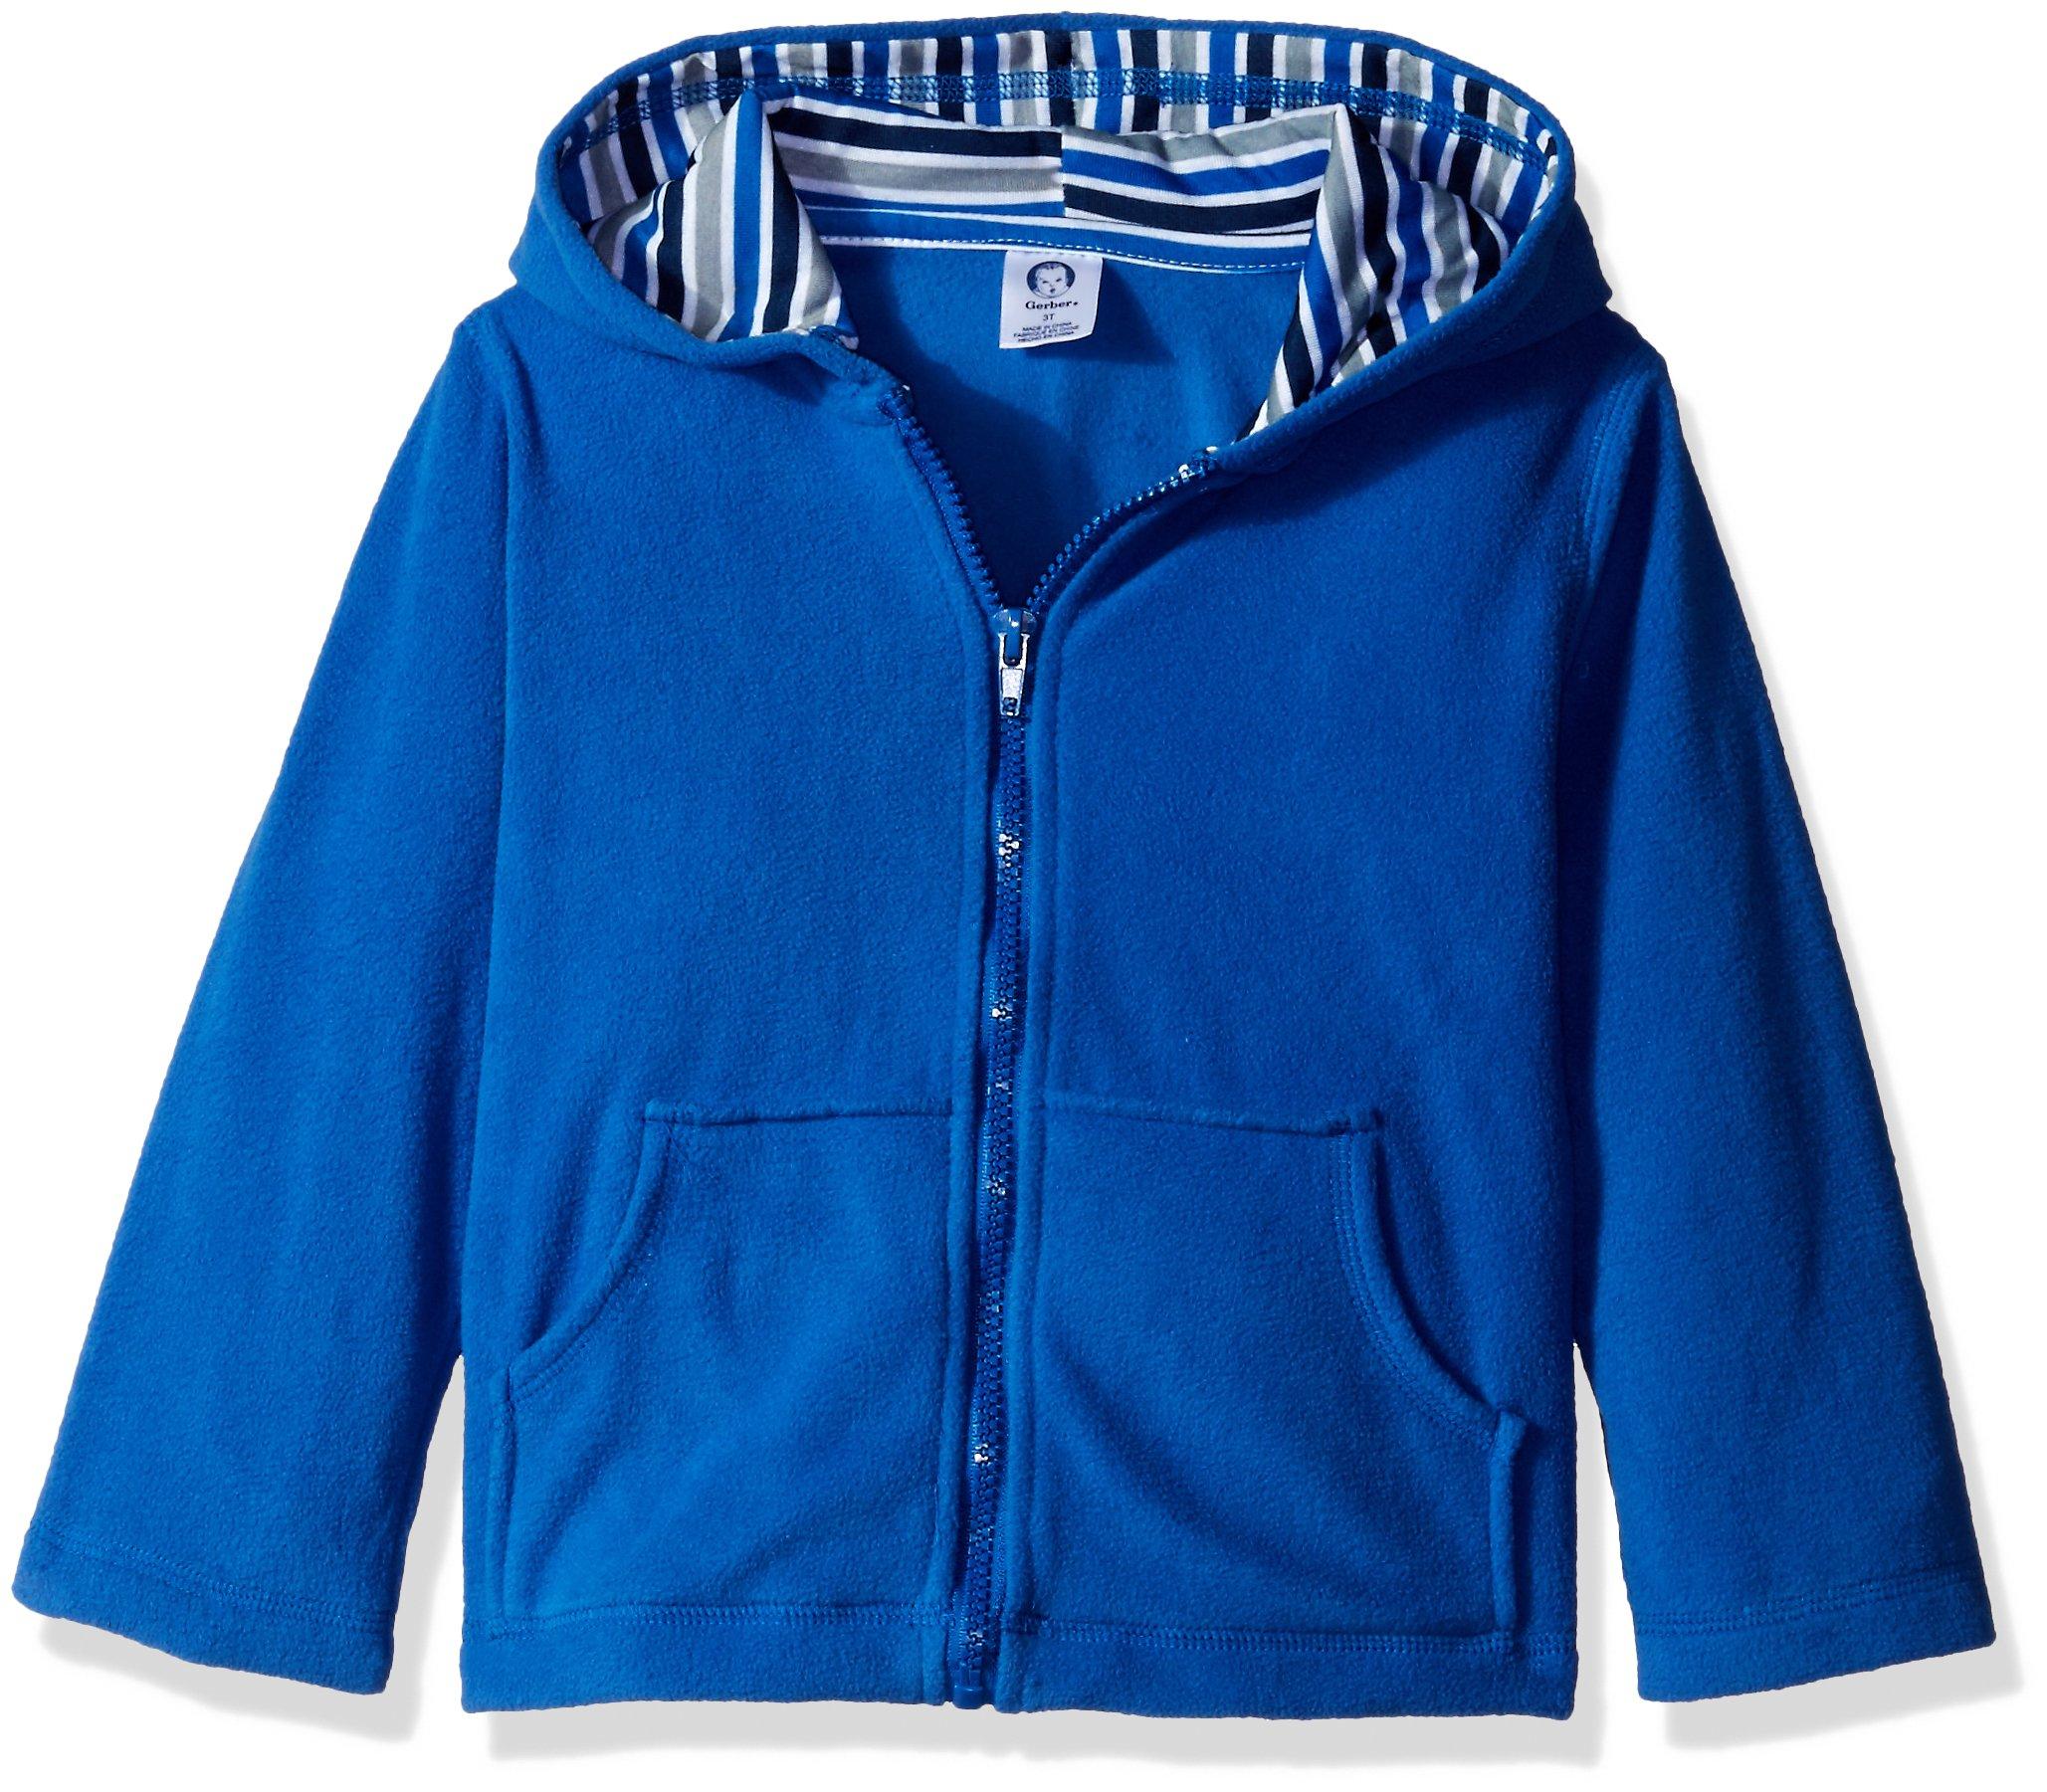 Gerber Little Boys' Toddler Hooded Micro Fleece Jacket, Blue, 3T by Gerber